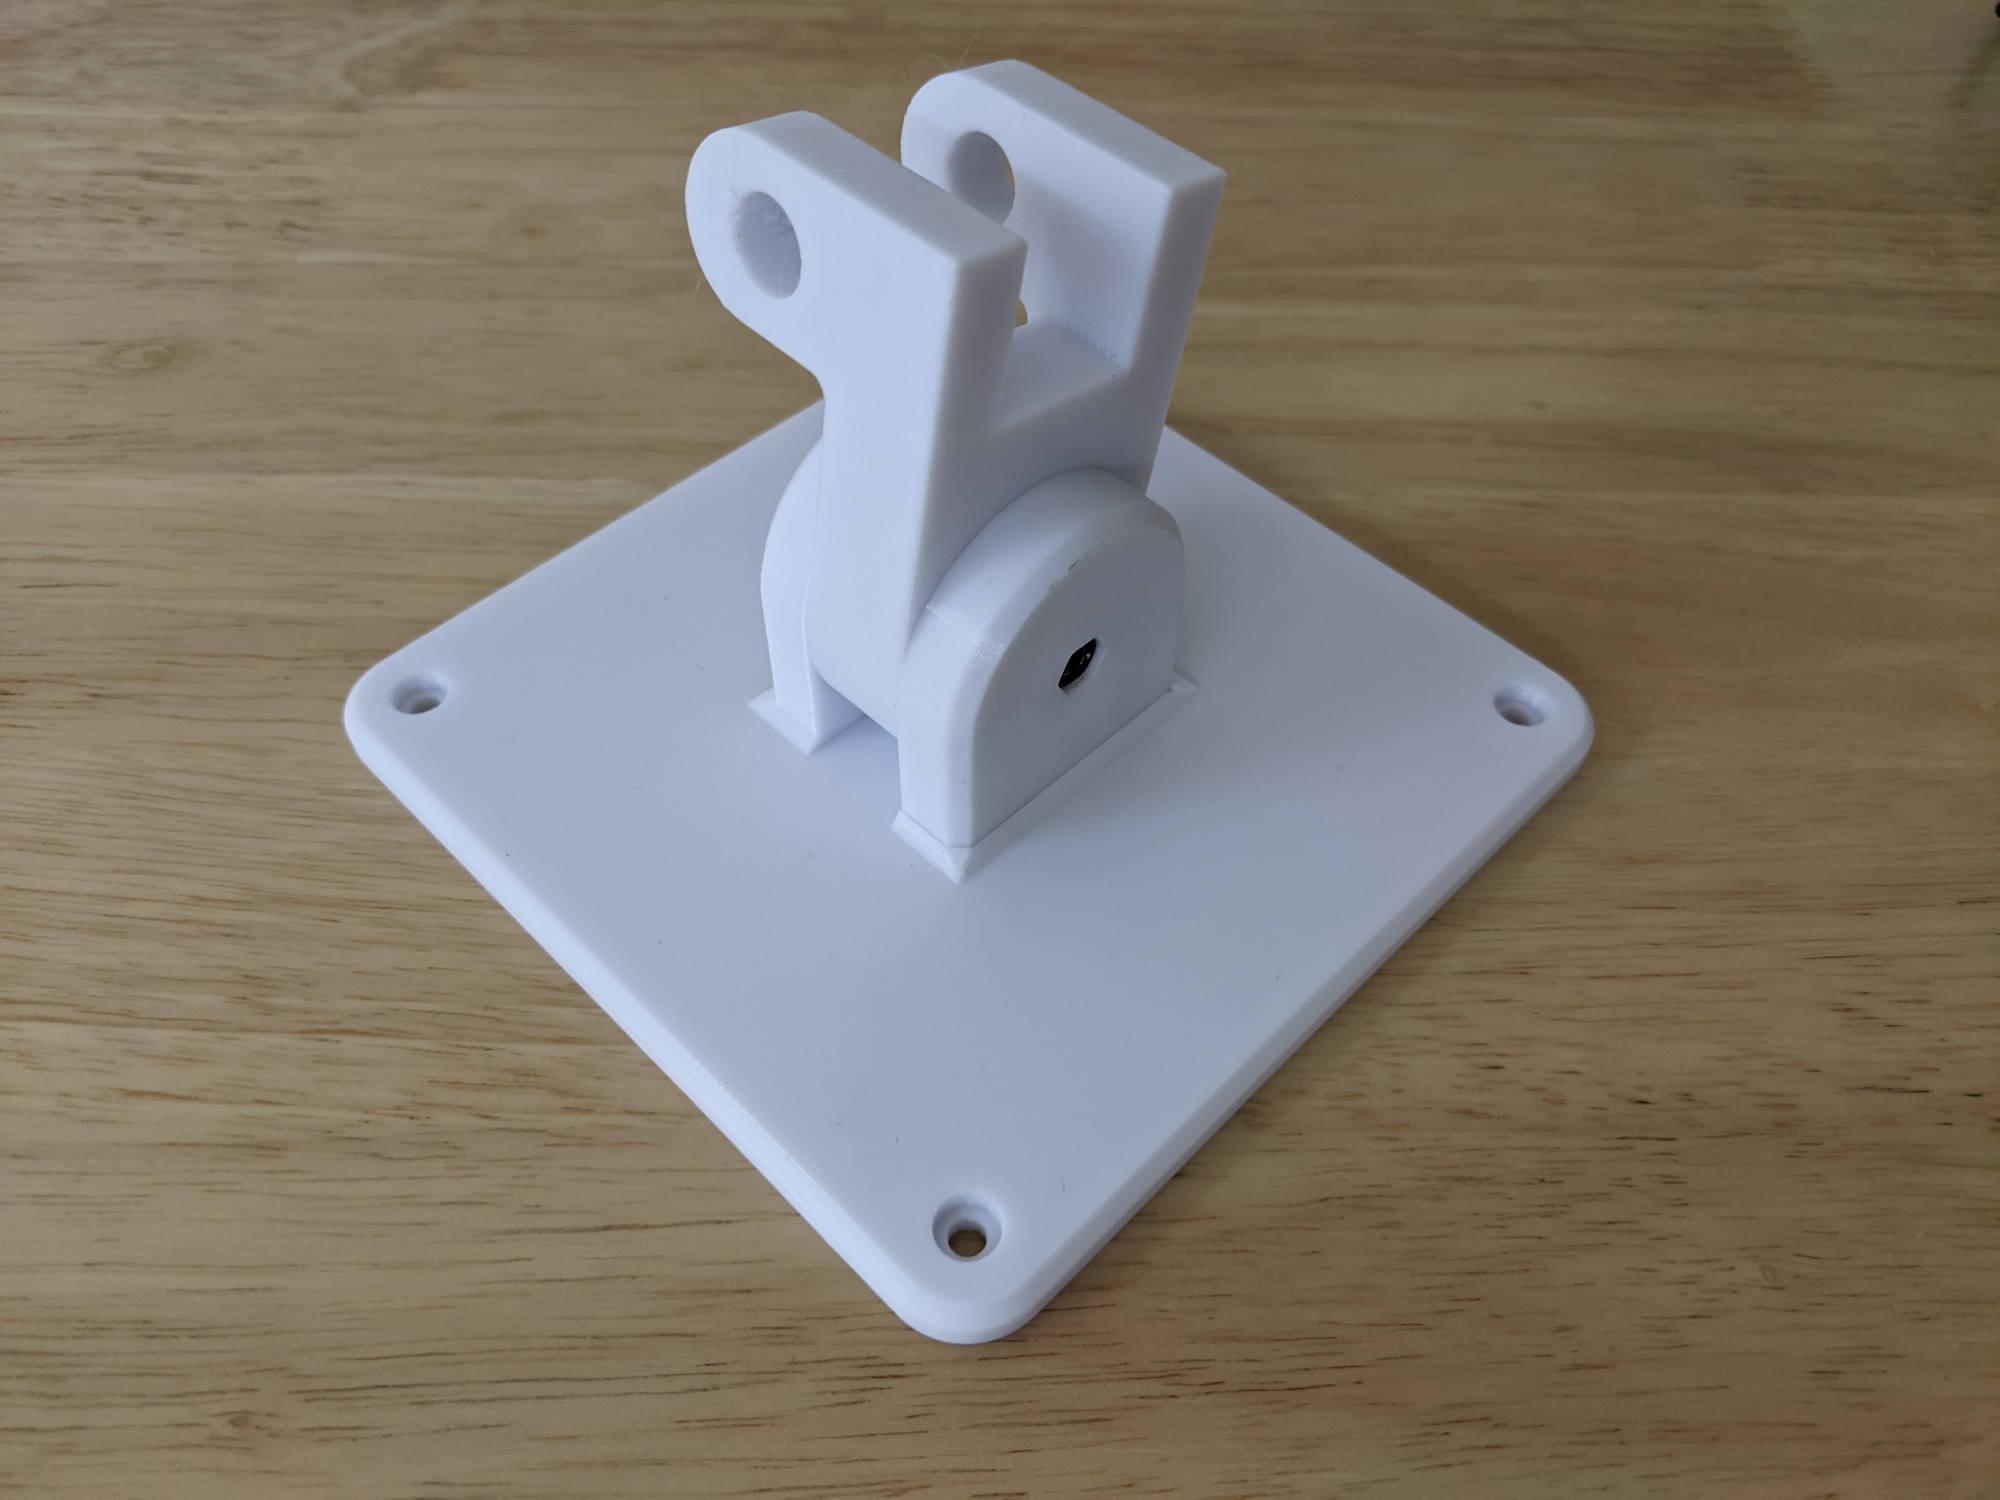 VESA-Mount-for-DRO-Arm-assembled.jpg